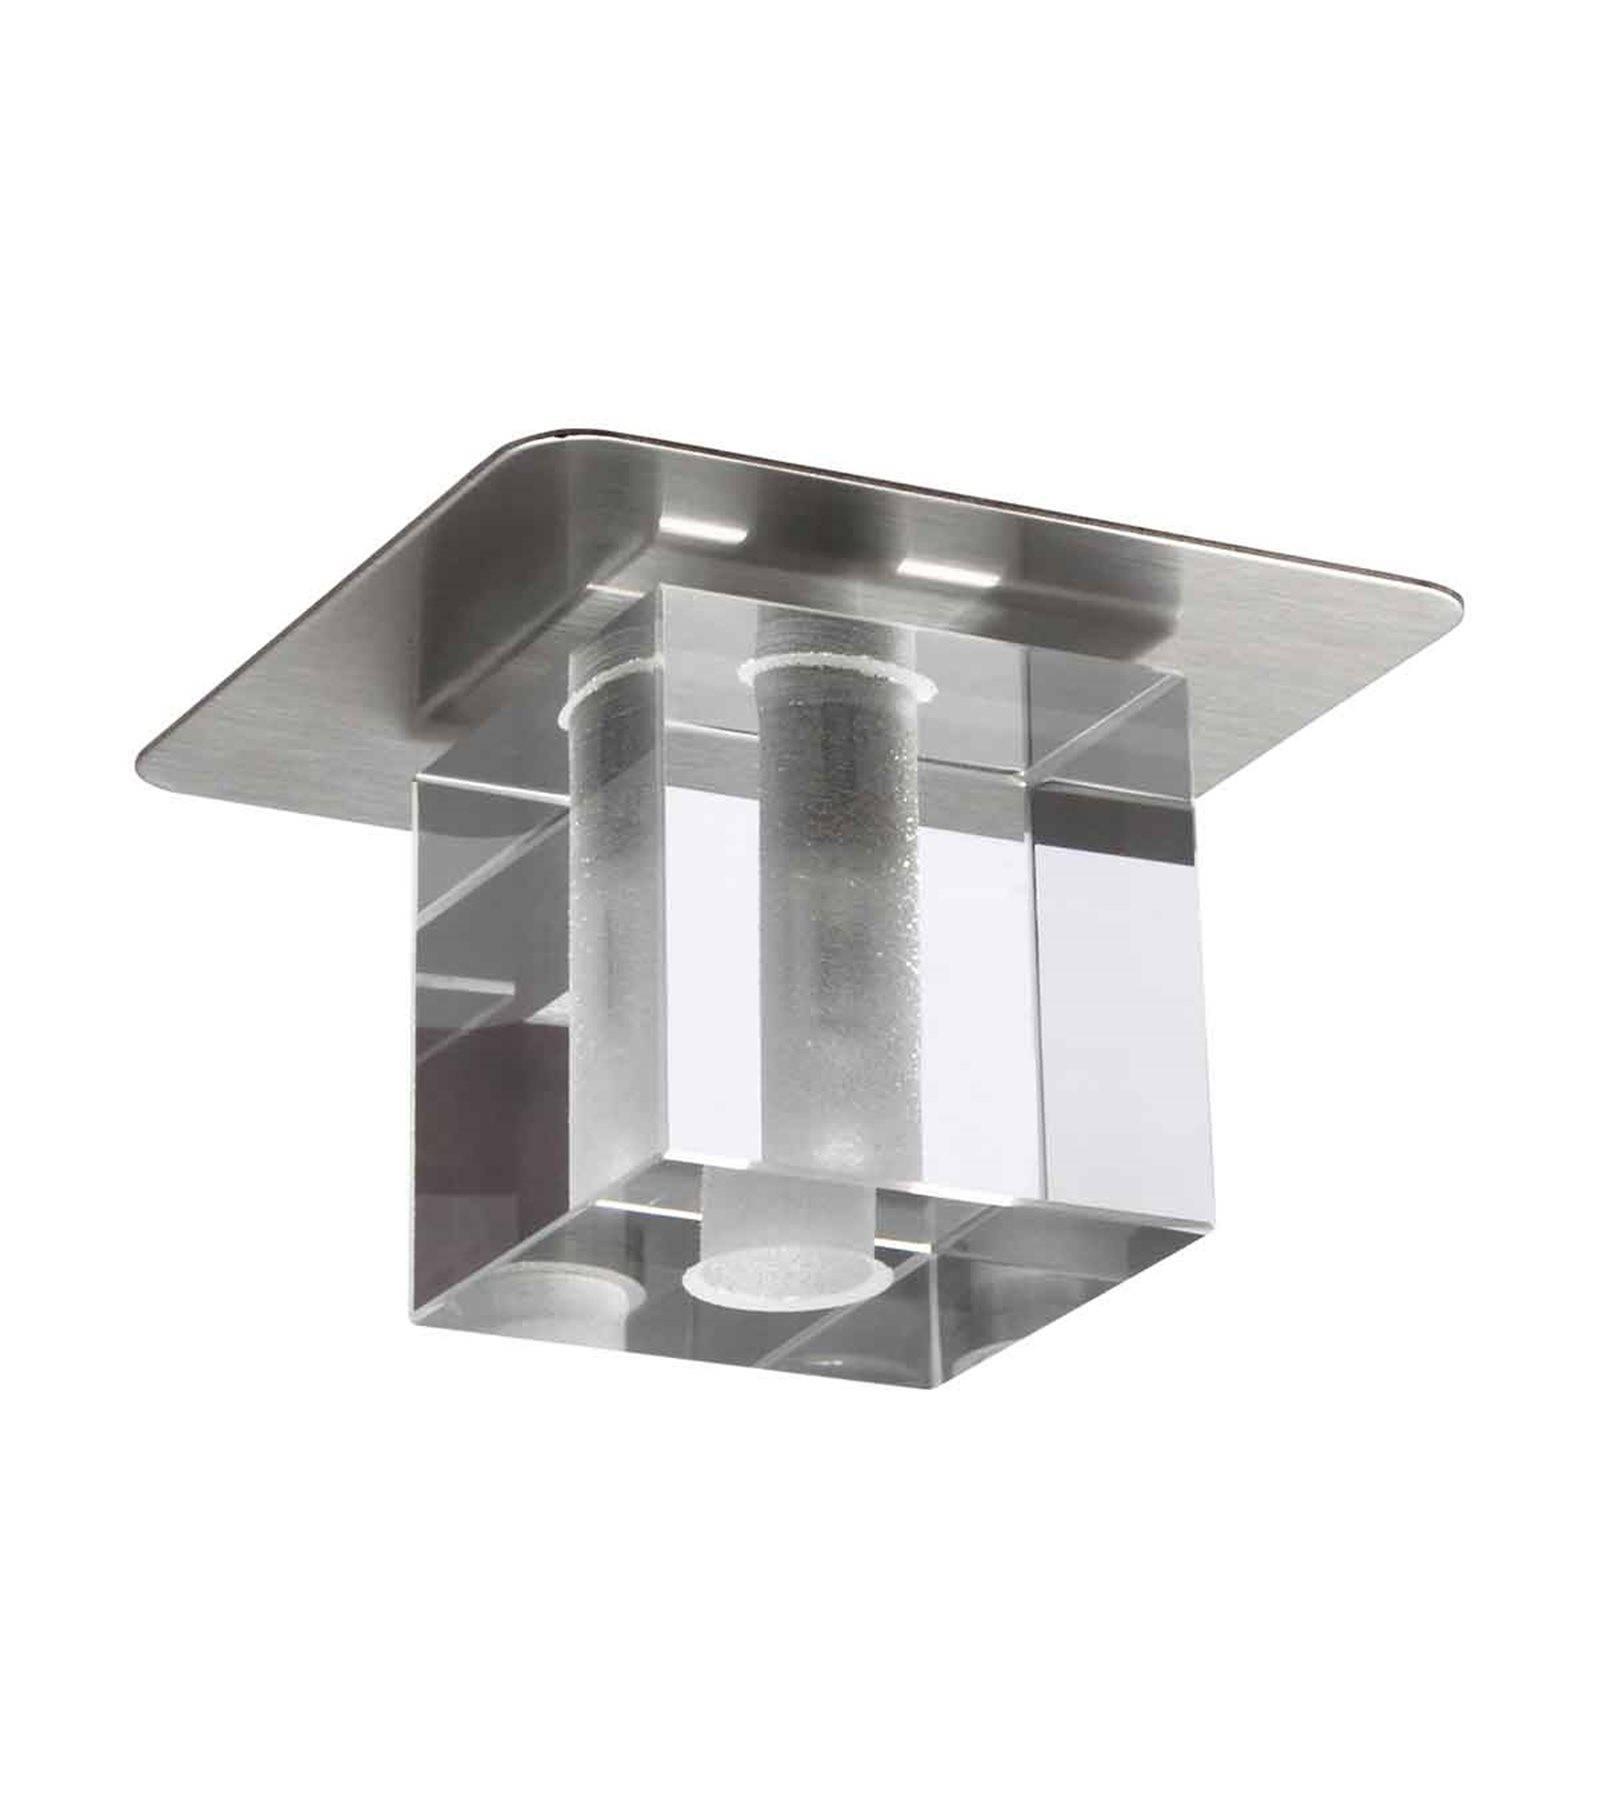 spot encastrable david osaka nickel carr g4 ip20 kanlux plafonnier siageo. Black Bedroom Furniture Sets. Home Design Ideas